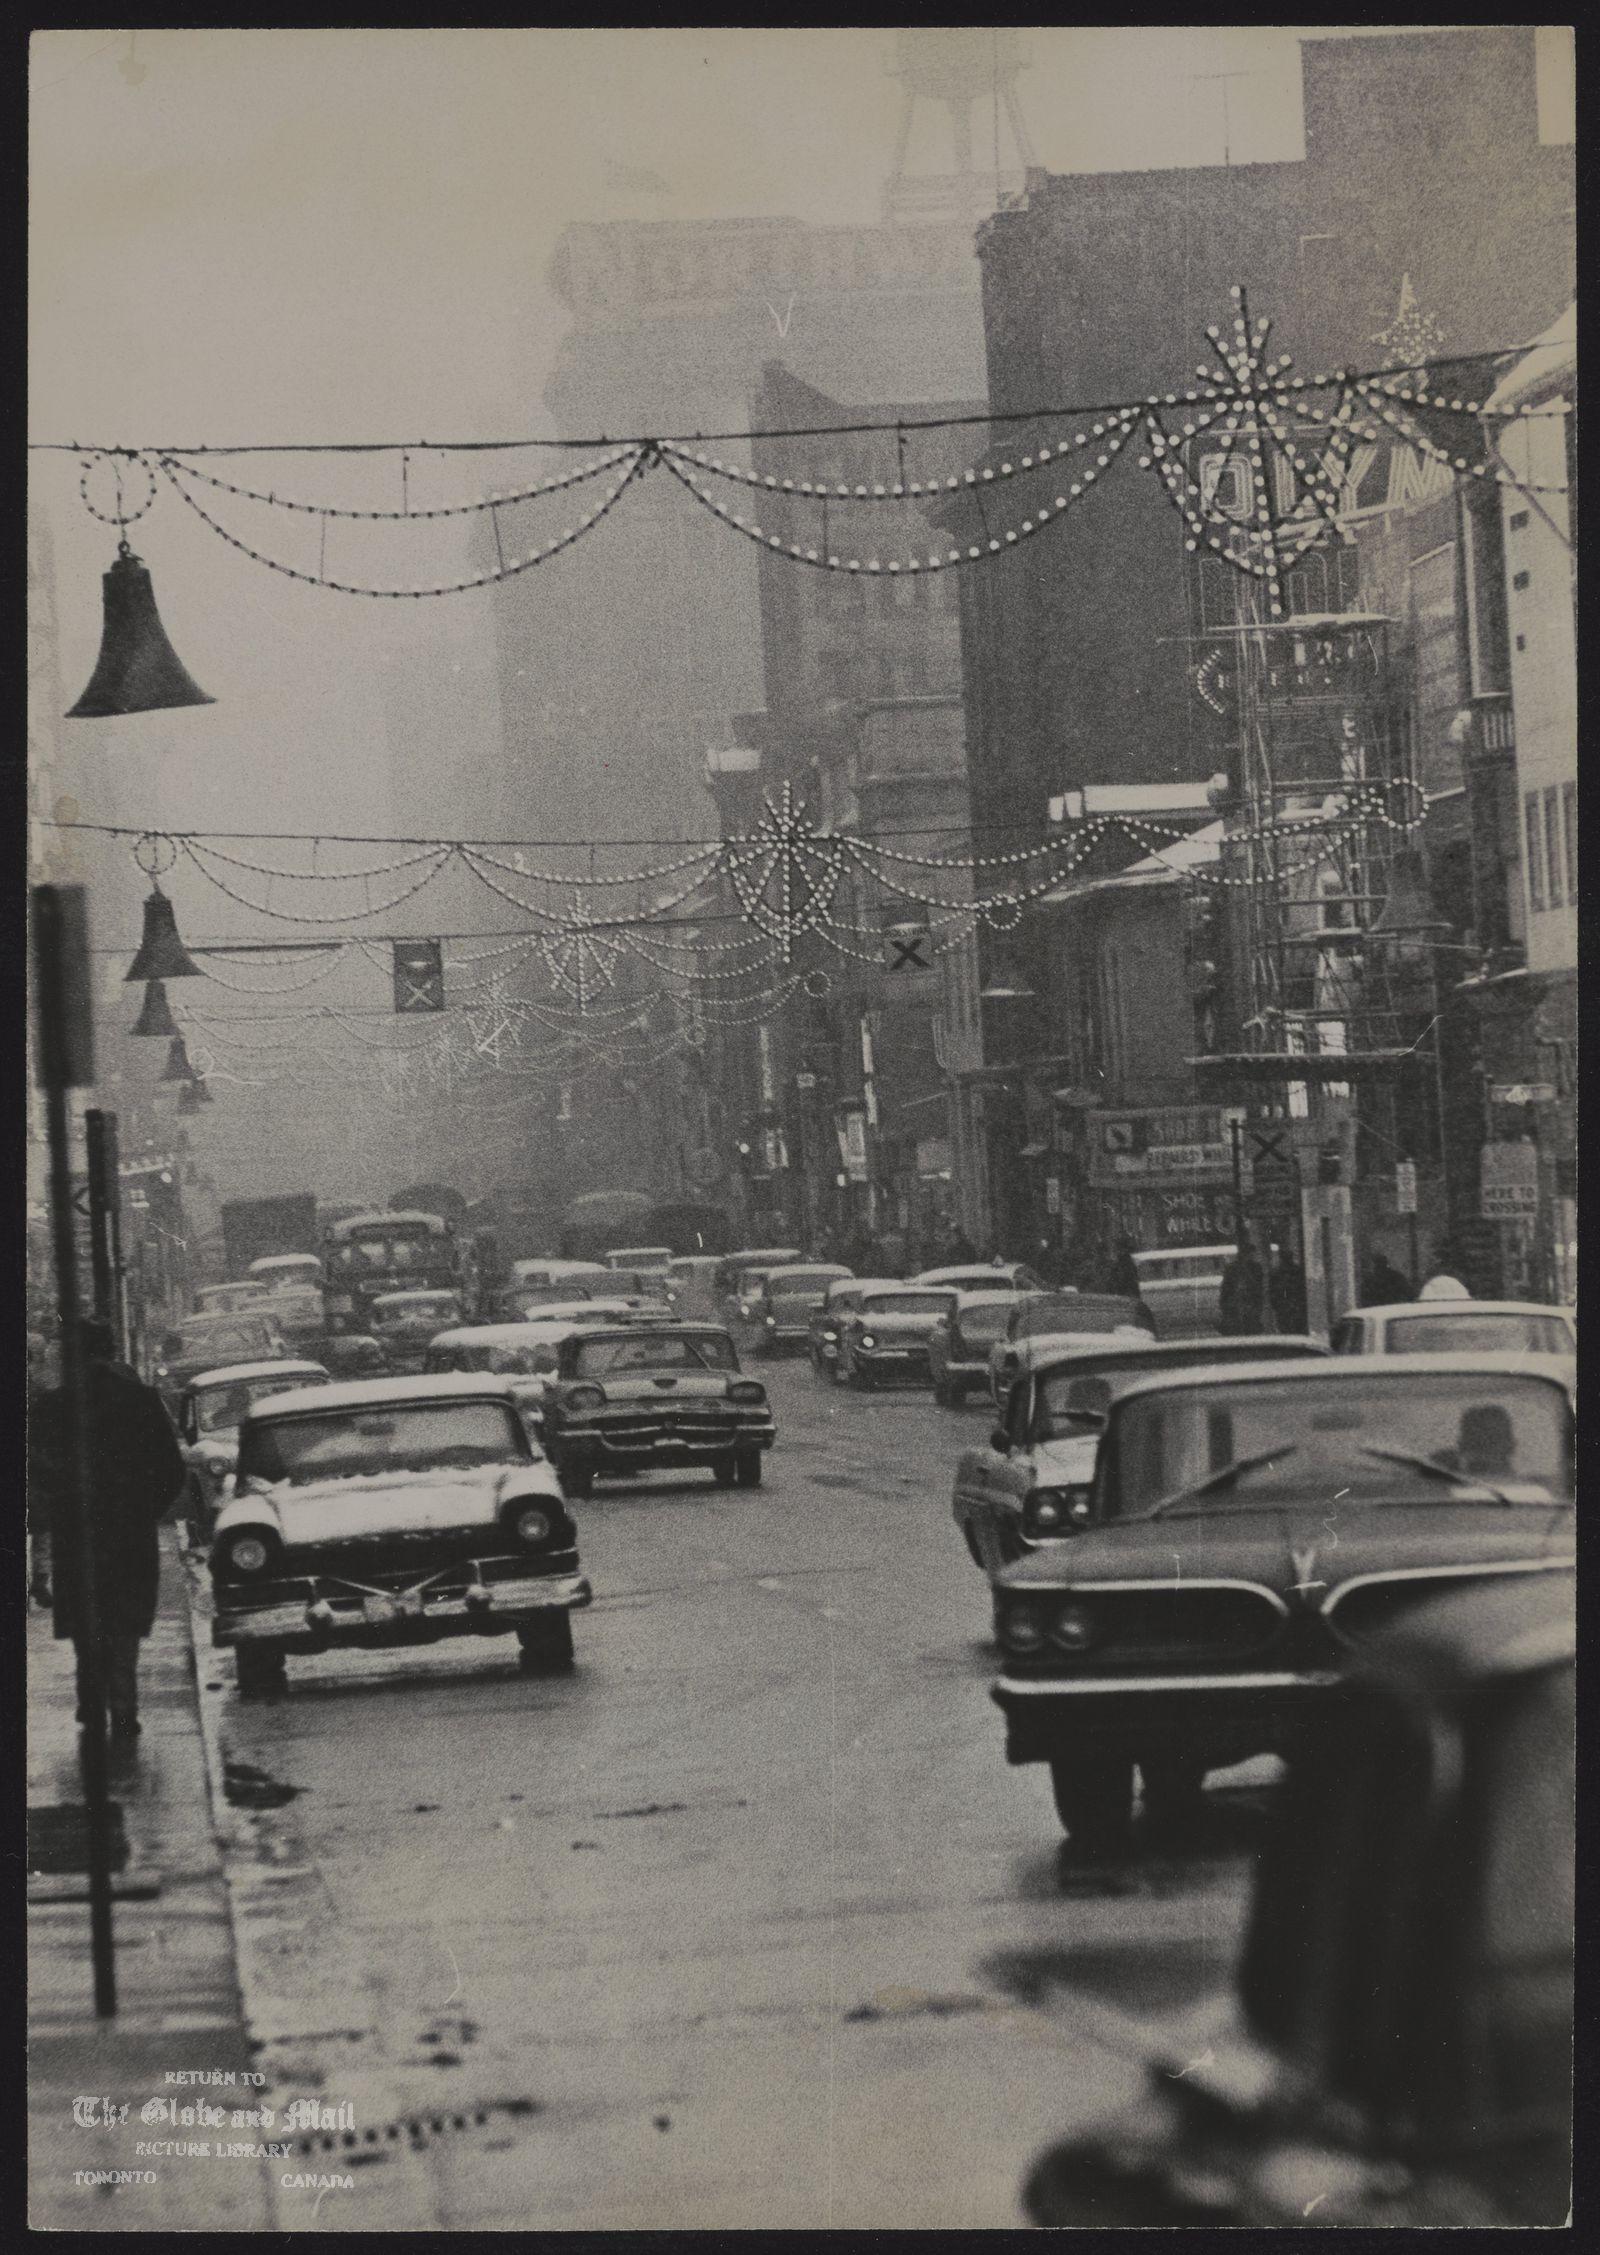 YONGE STREET (Toronto) The days before Christmas